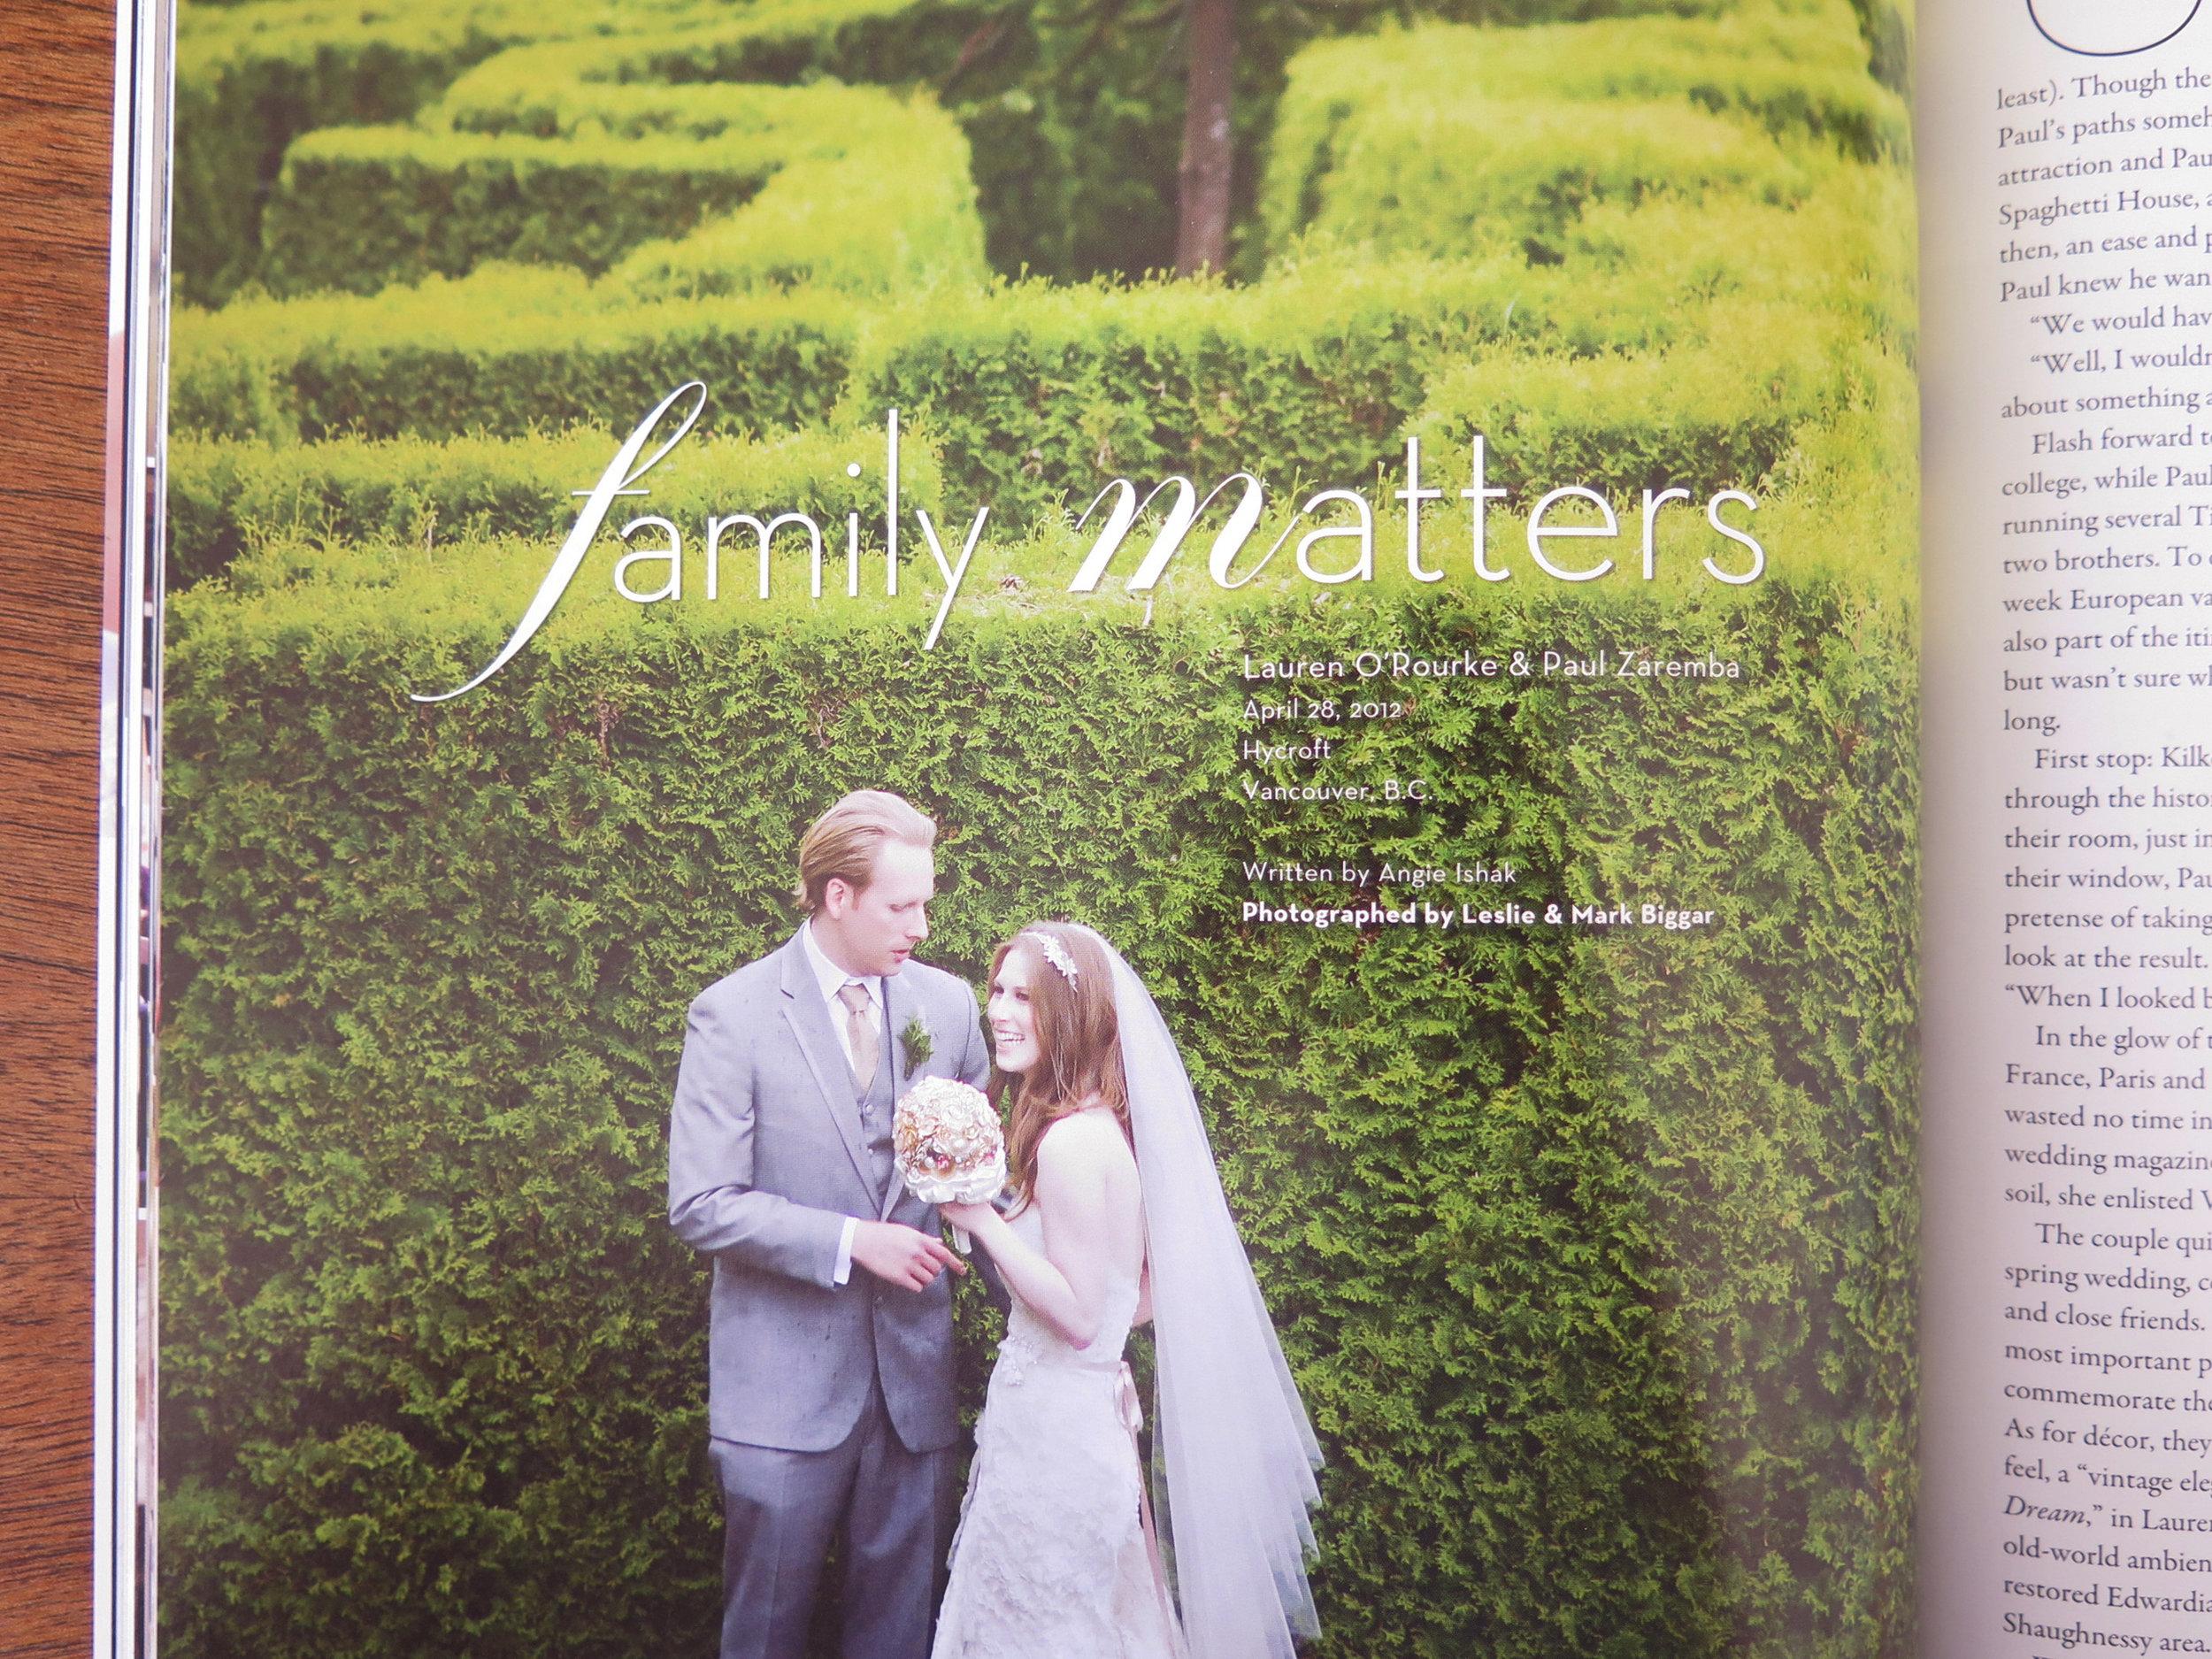 rw-family matters.JPG